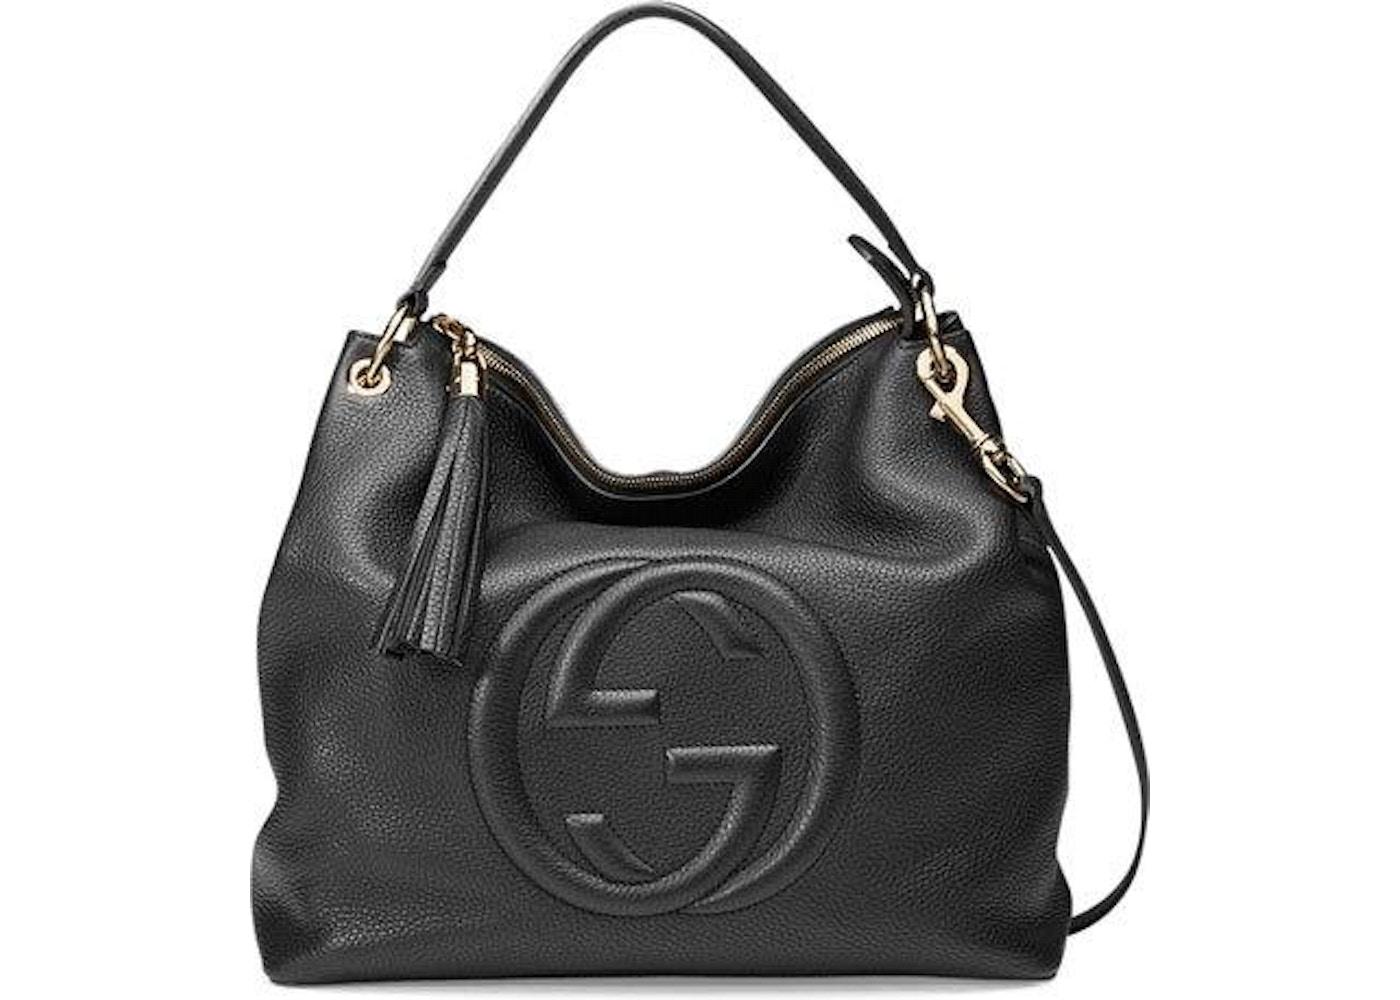 Gucci Hobo Bag Soho Large Black 8e8cdacc72700